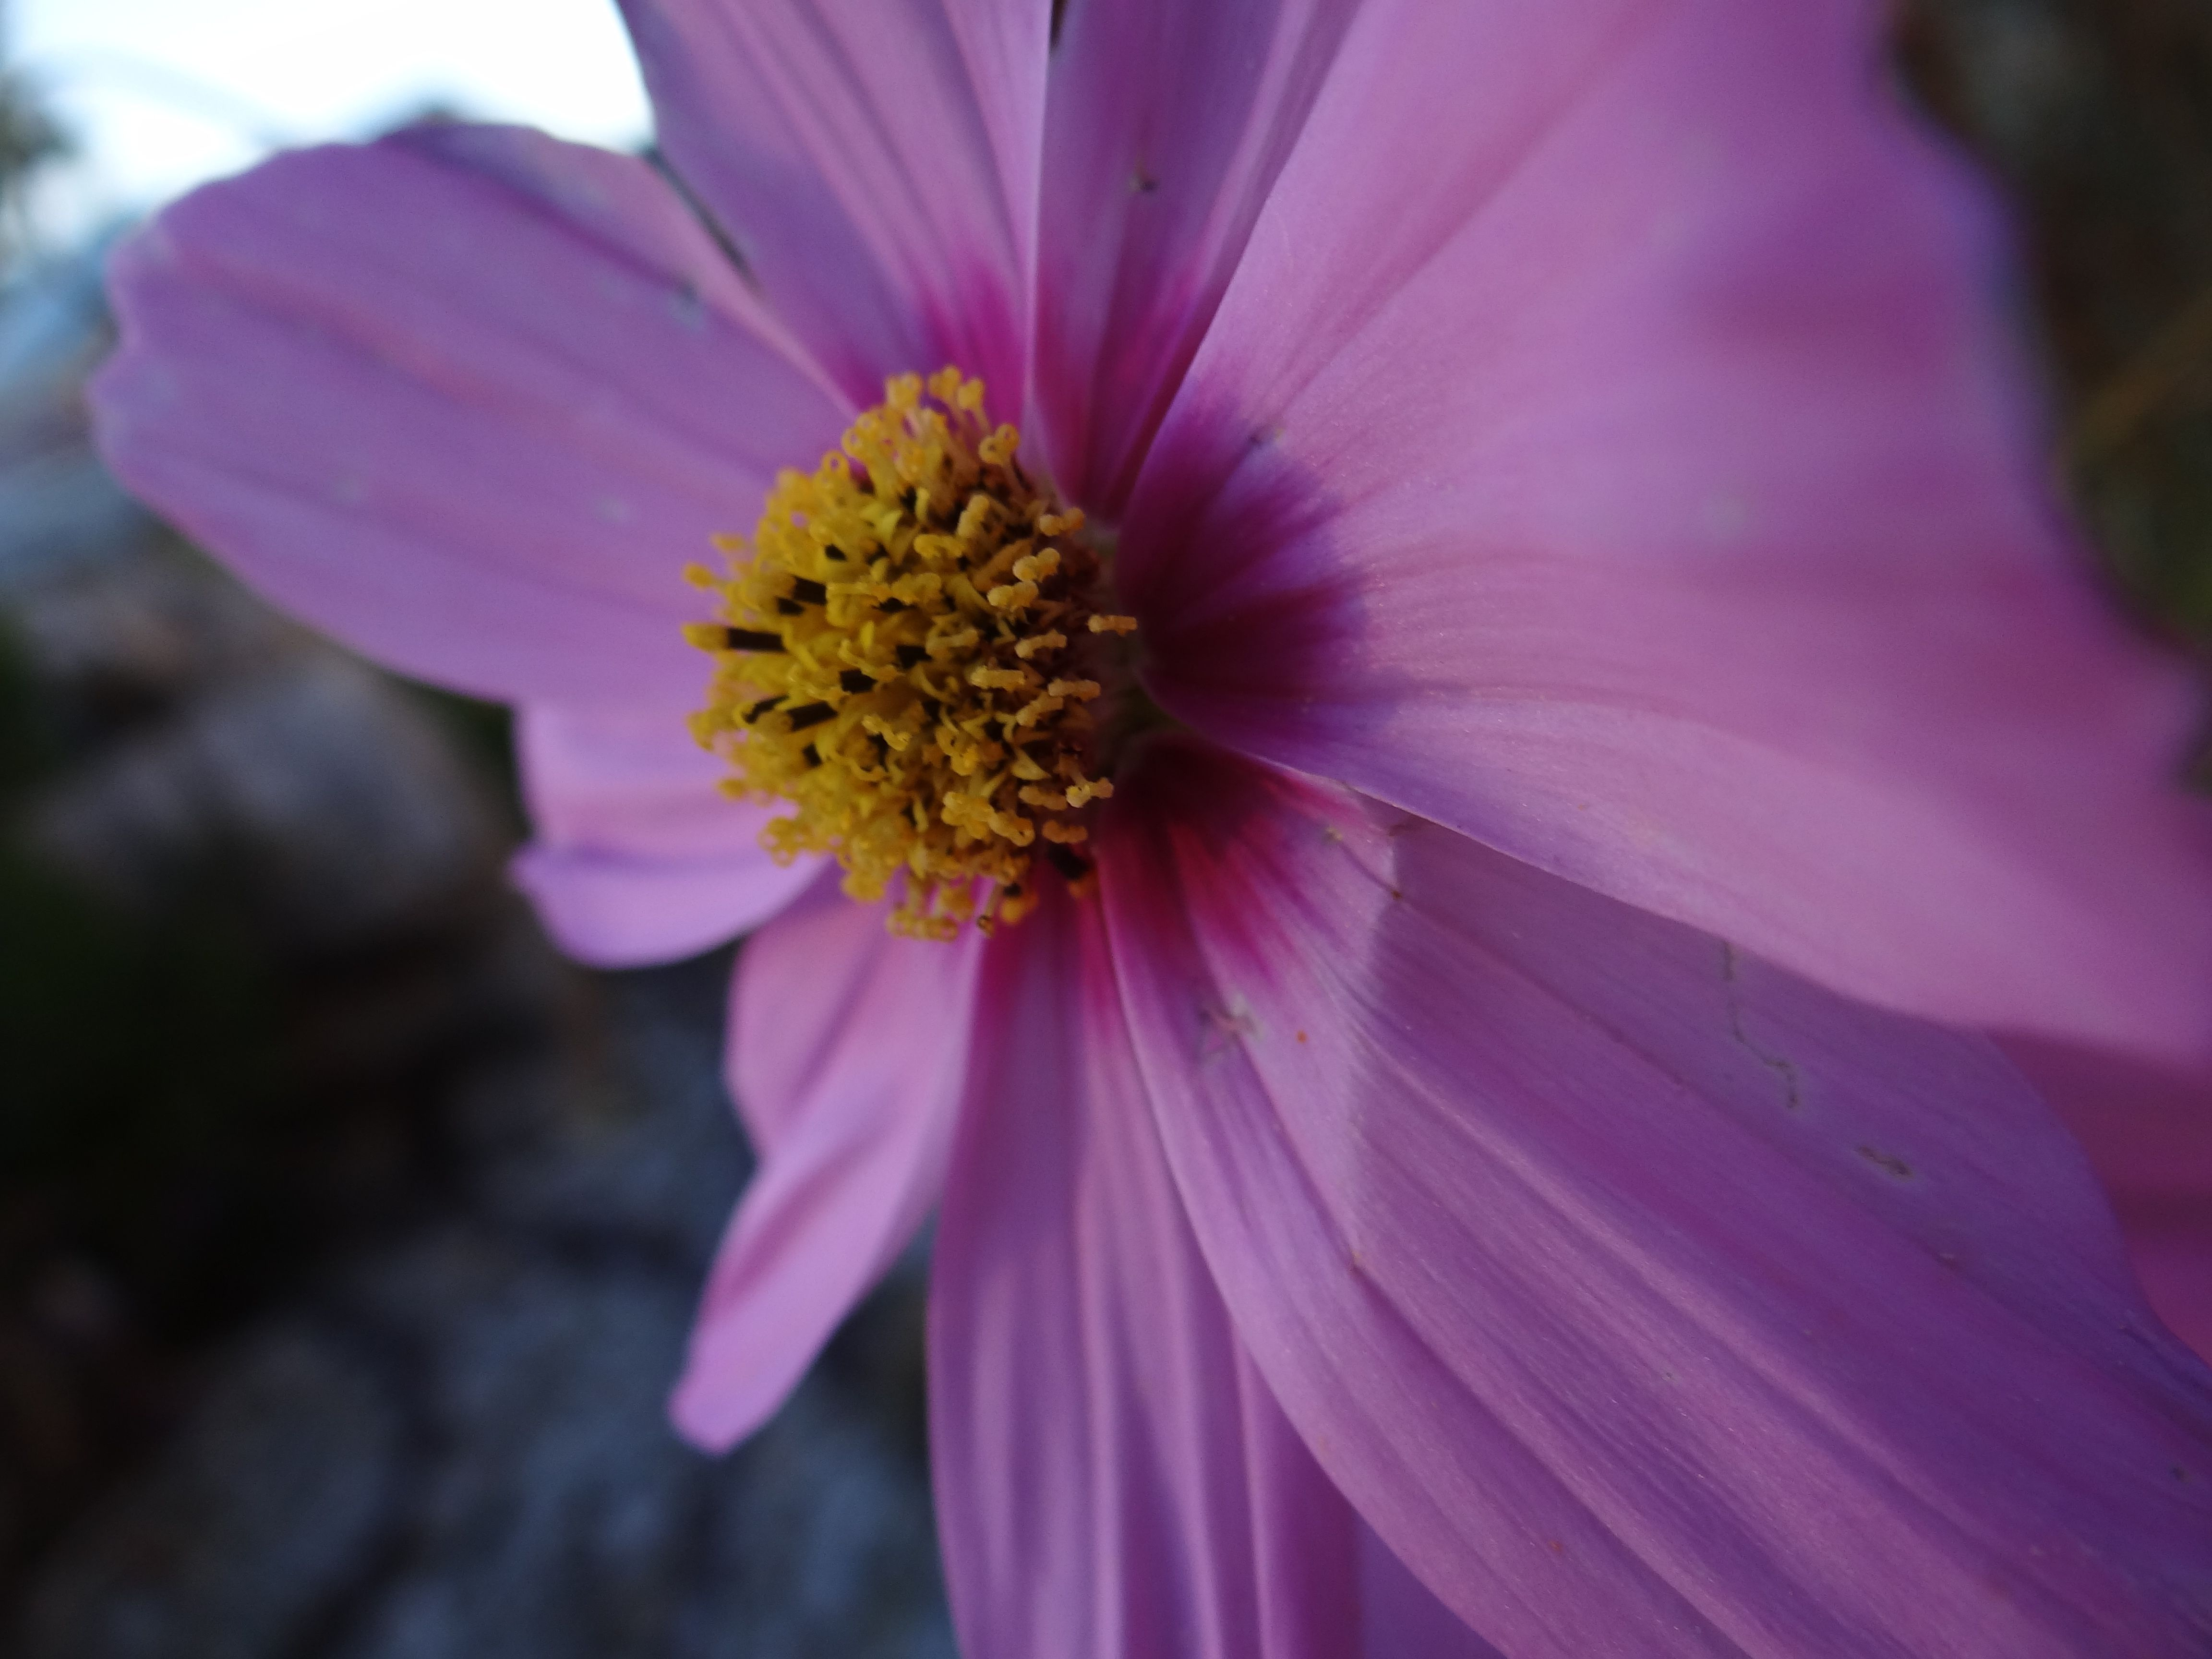 Side View of a Flower-Michaela Hawley